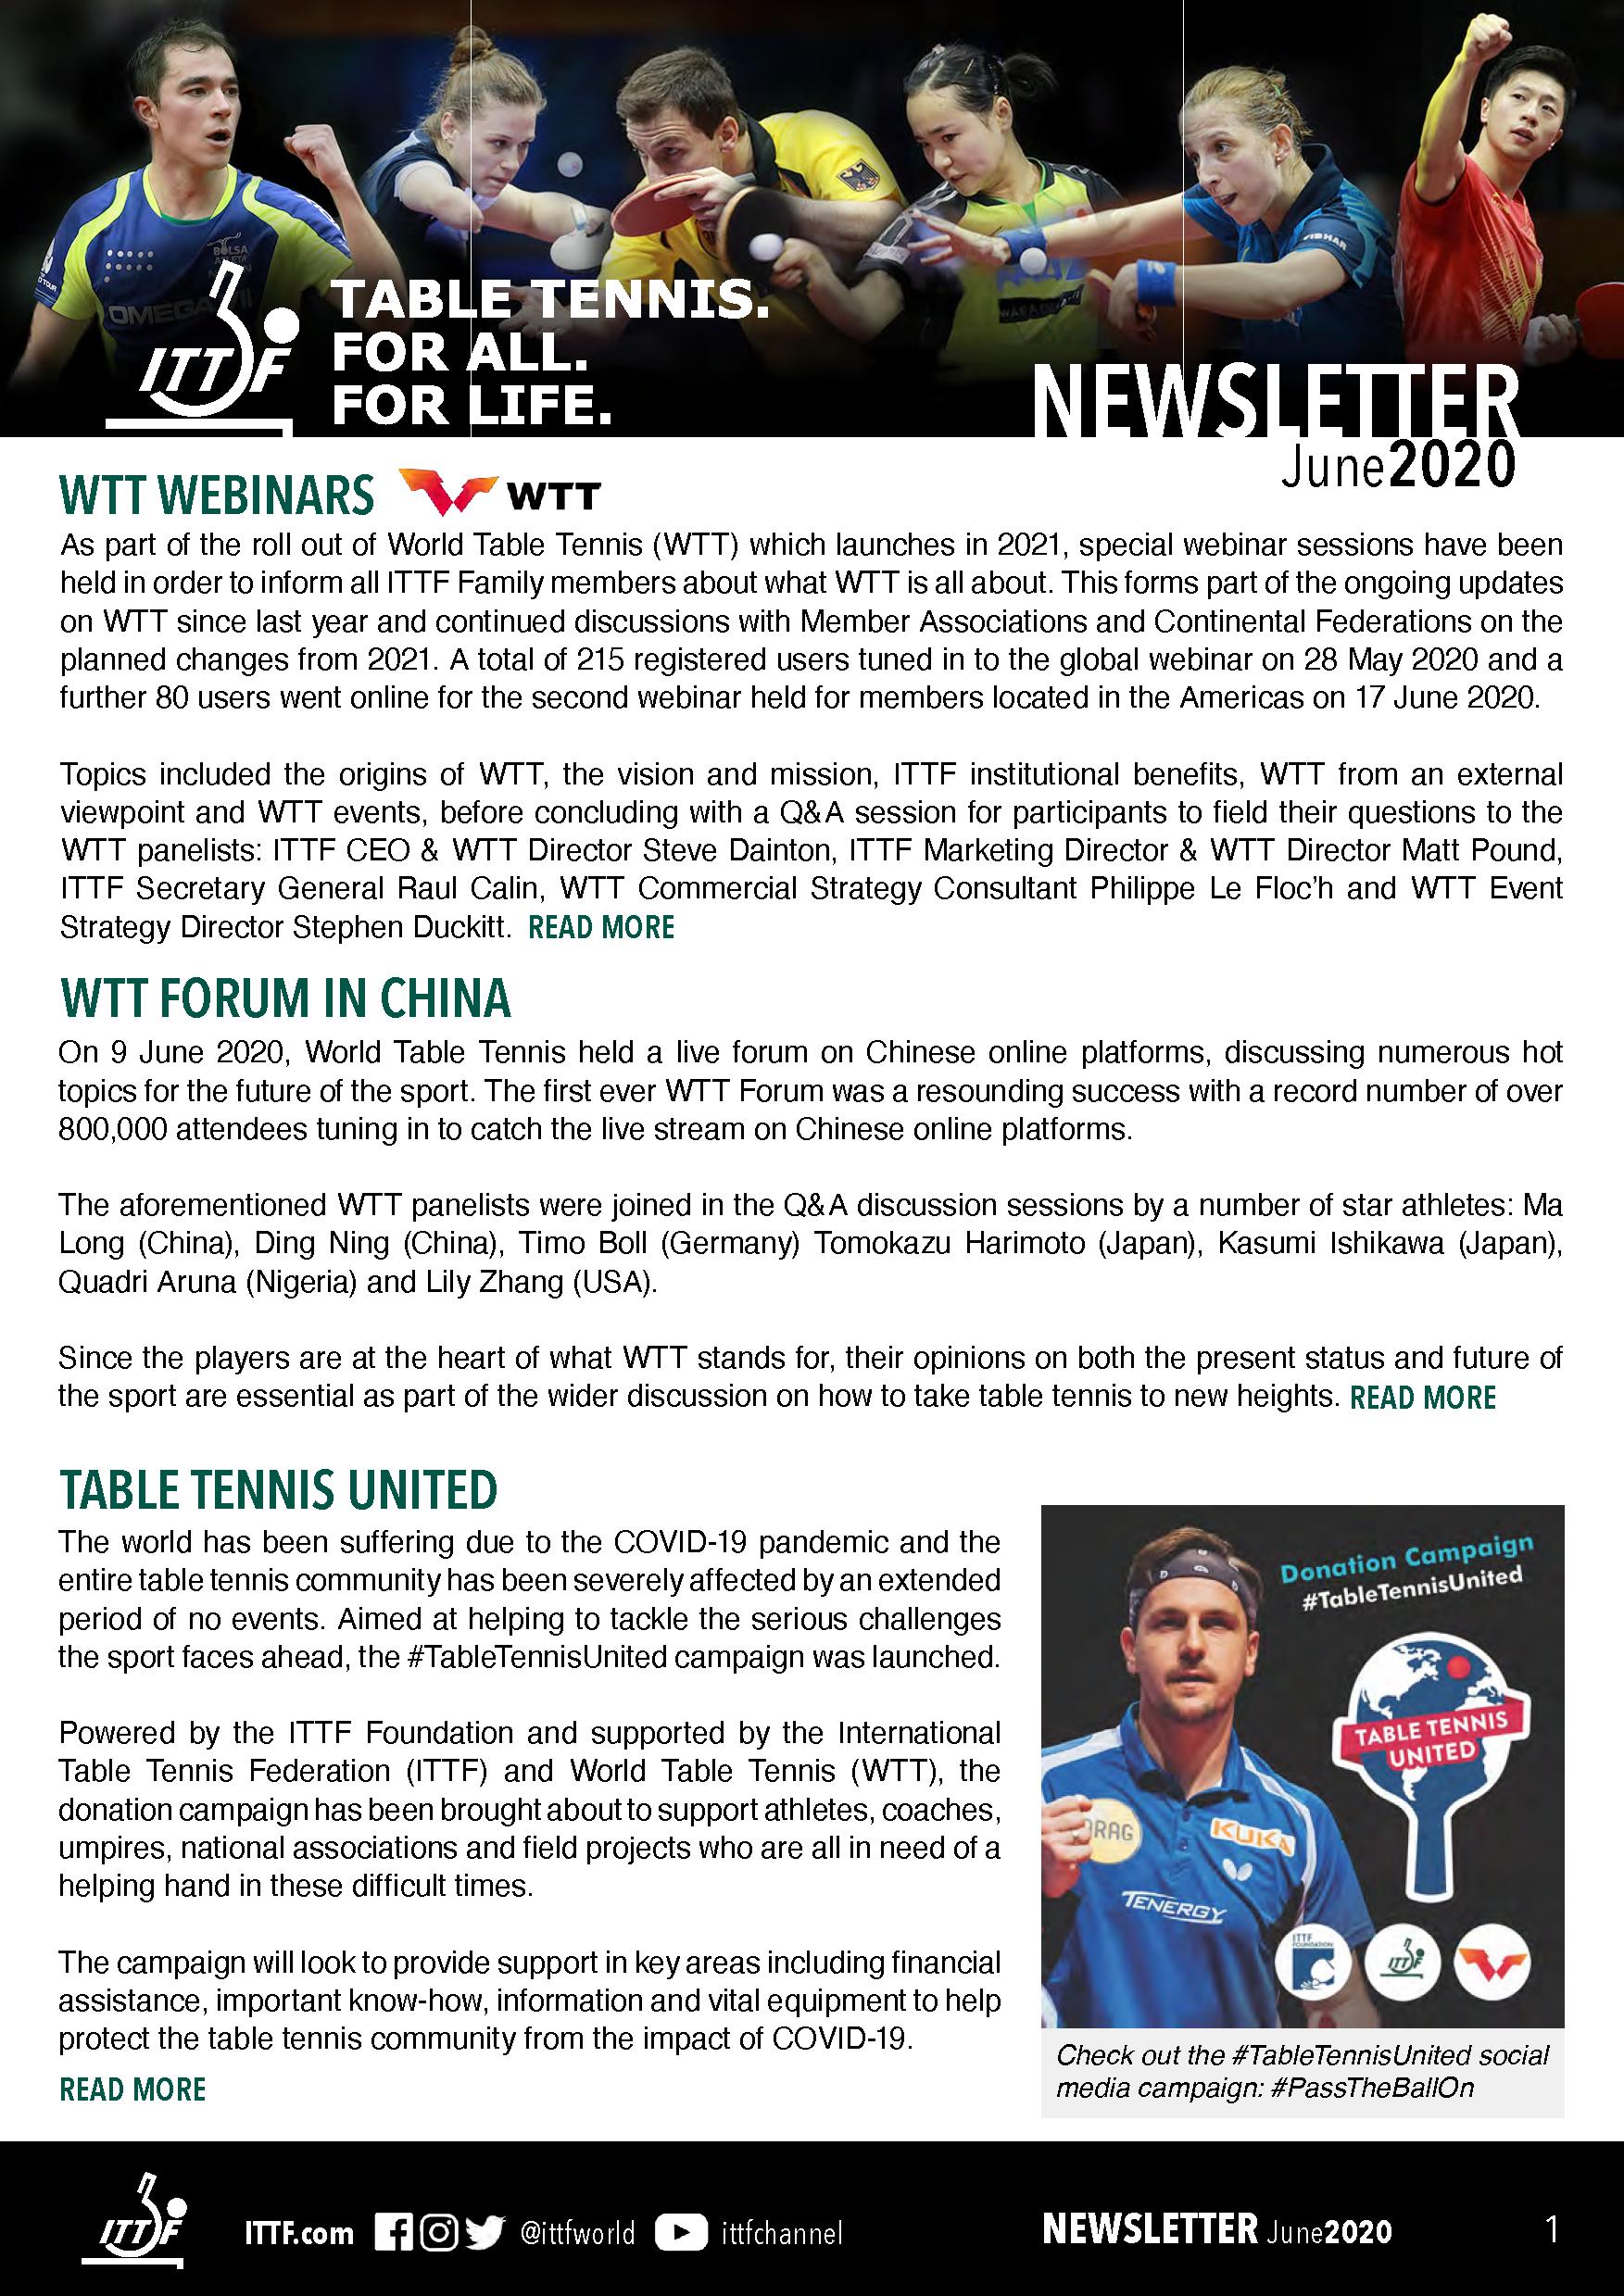 ITTF_Newsletter_04_JUN-2020_Page_1